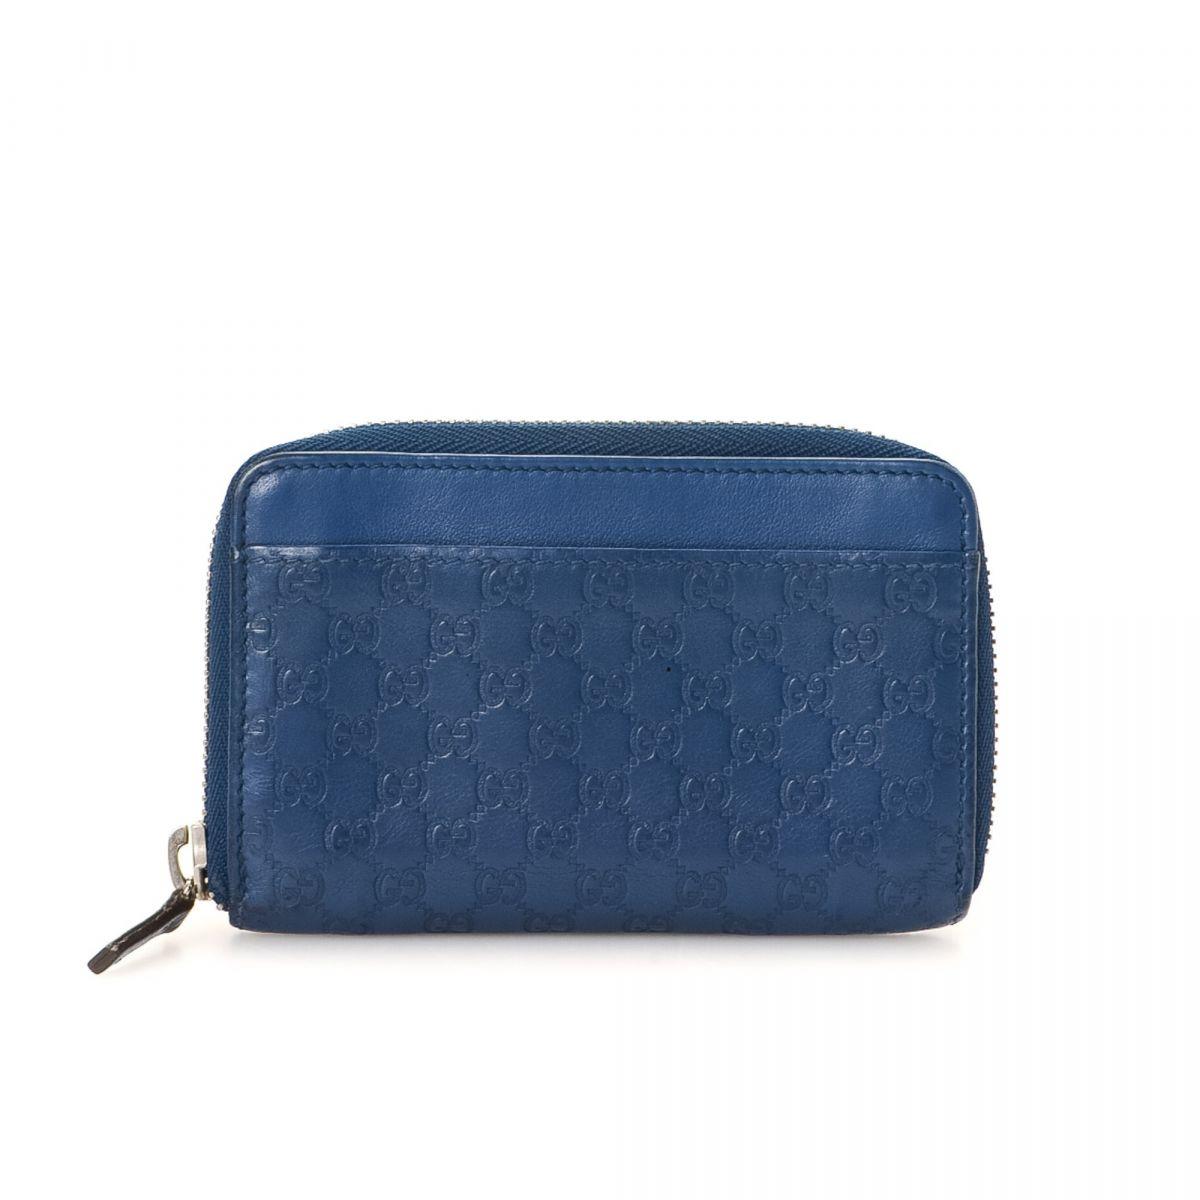 gucci key pouch. gucci microguccissima key pouch